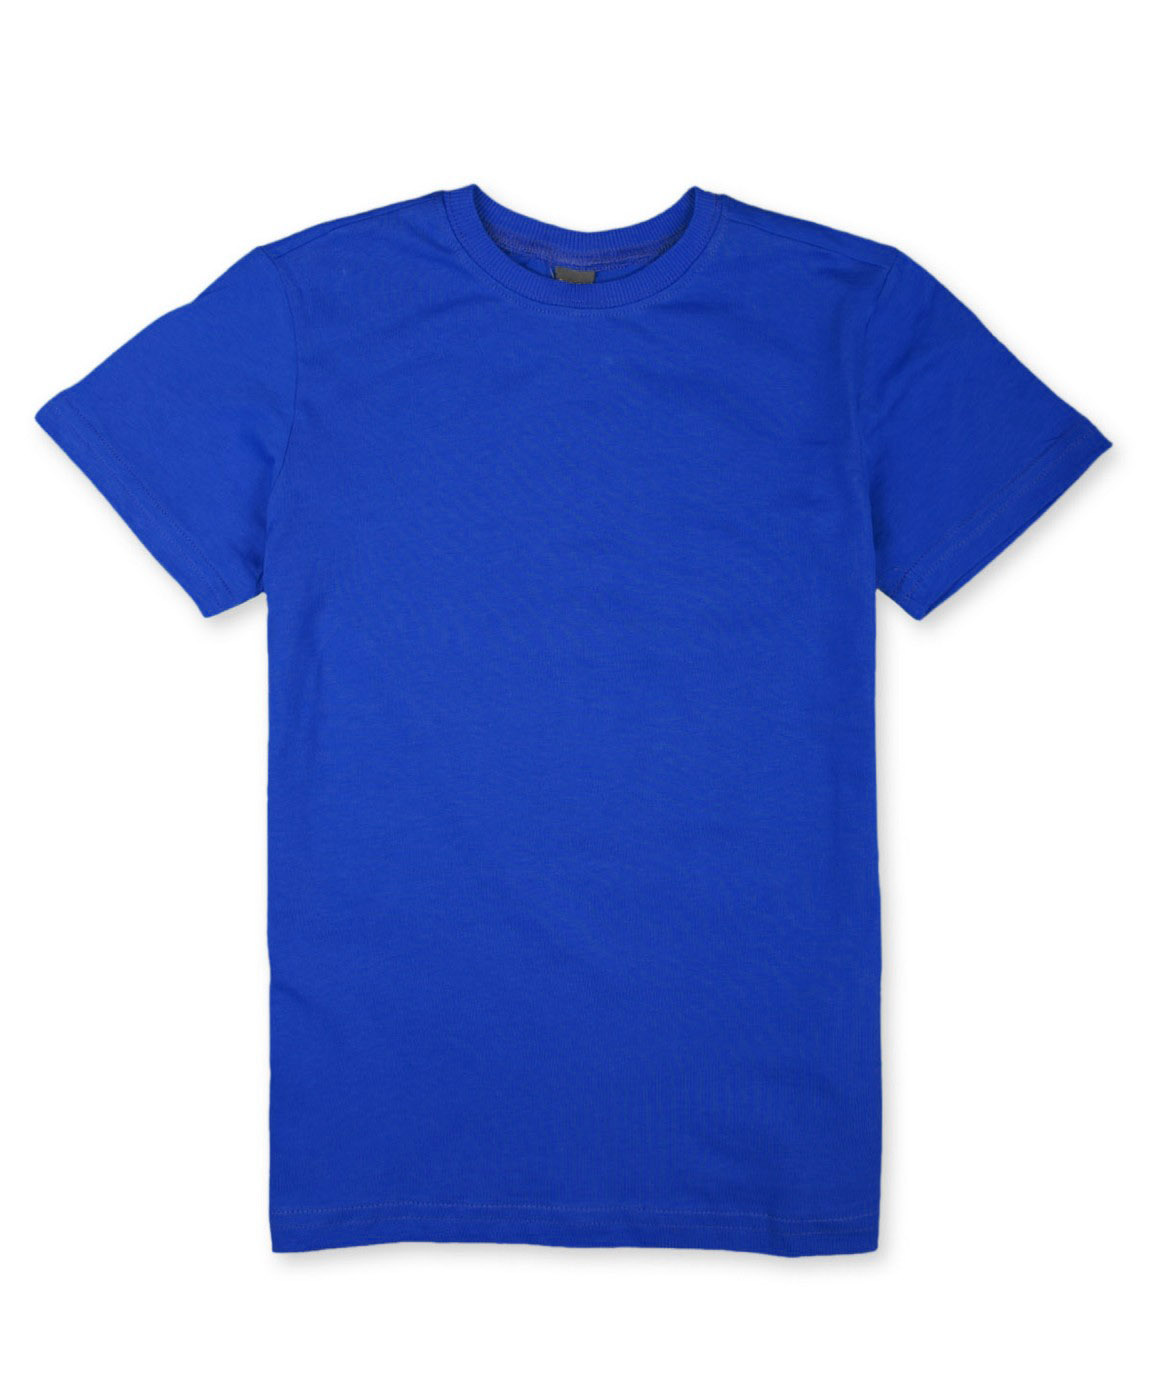 Футболка однотонная синяяФутболки и майки<br><br><br>Размер: 64